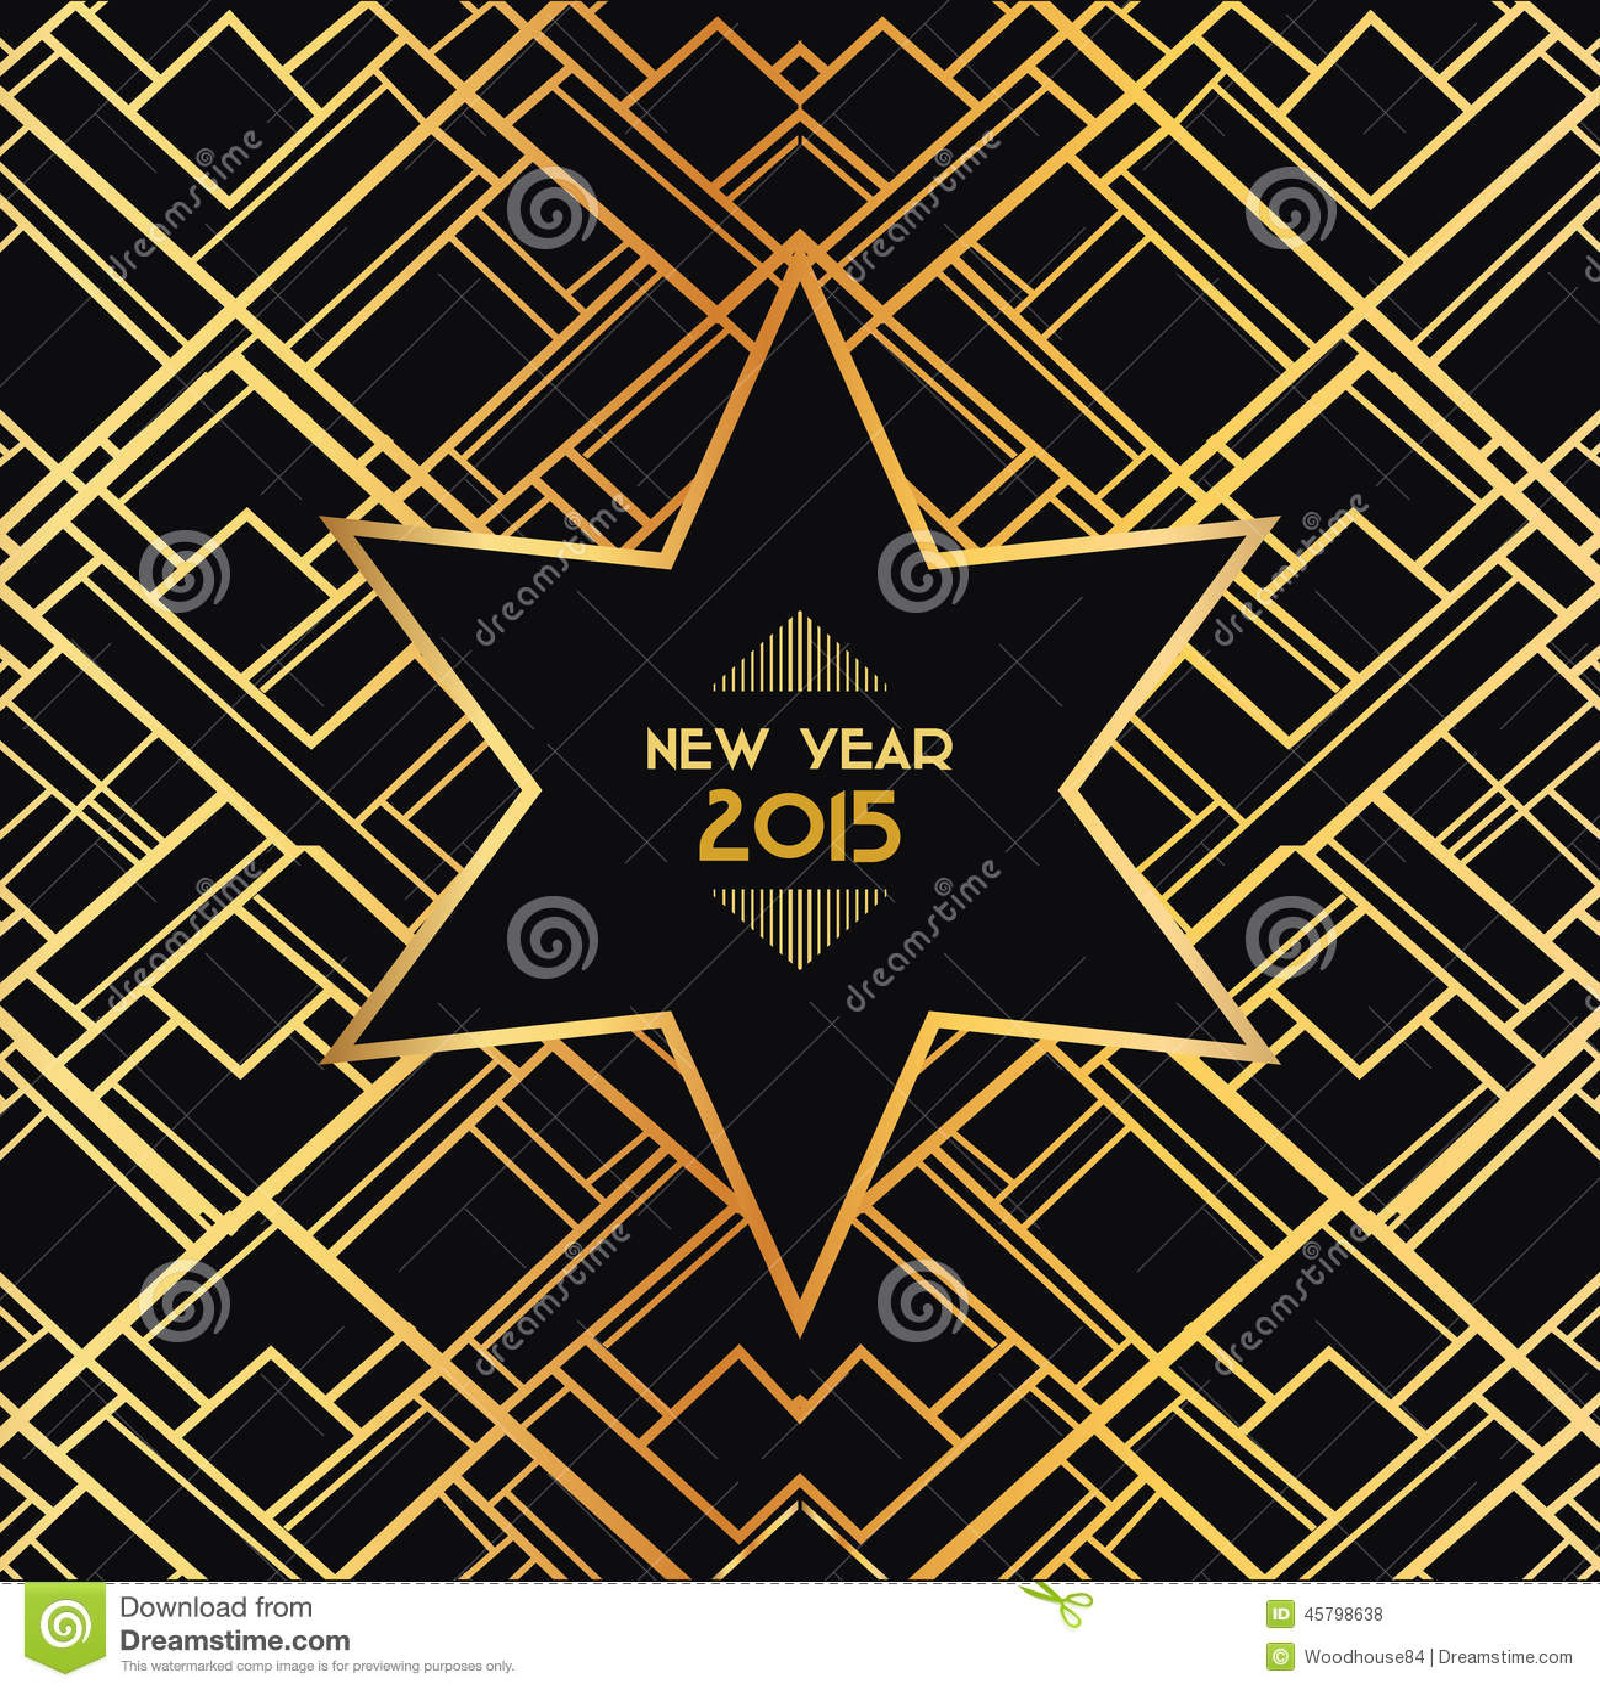 Christmas Art Deco Card Stock Vector Image 45798638